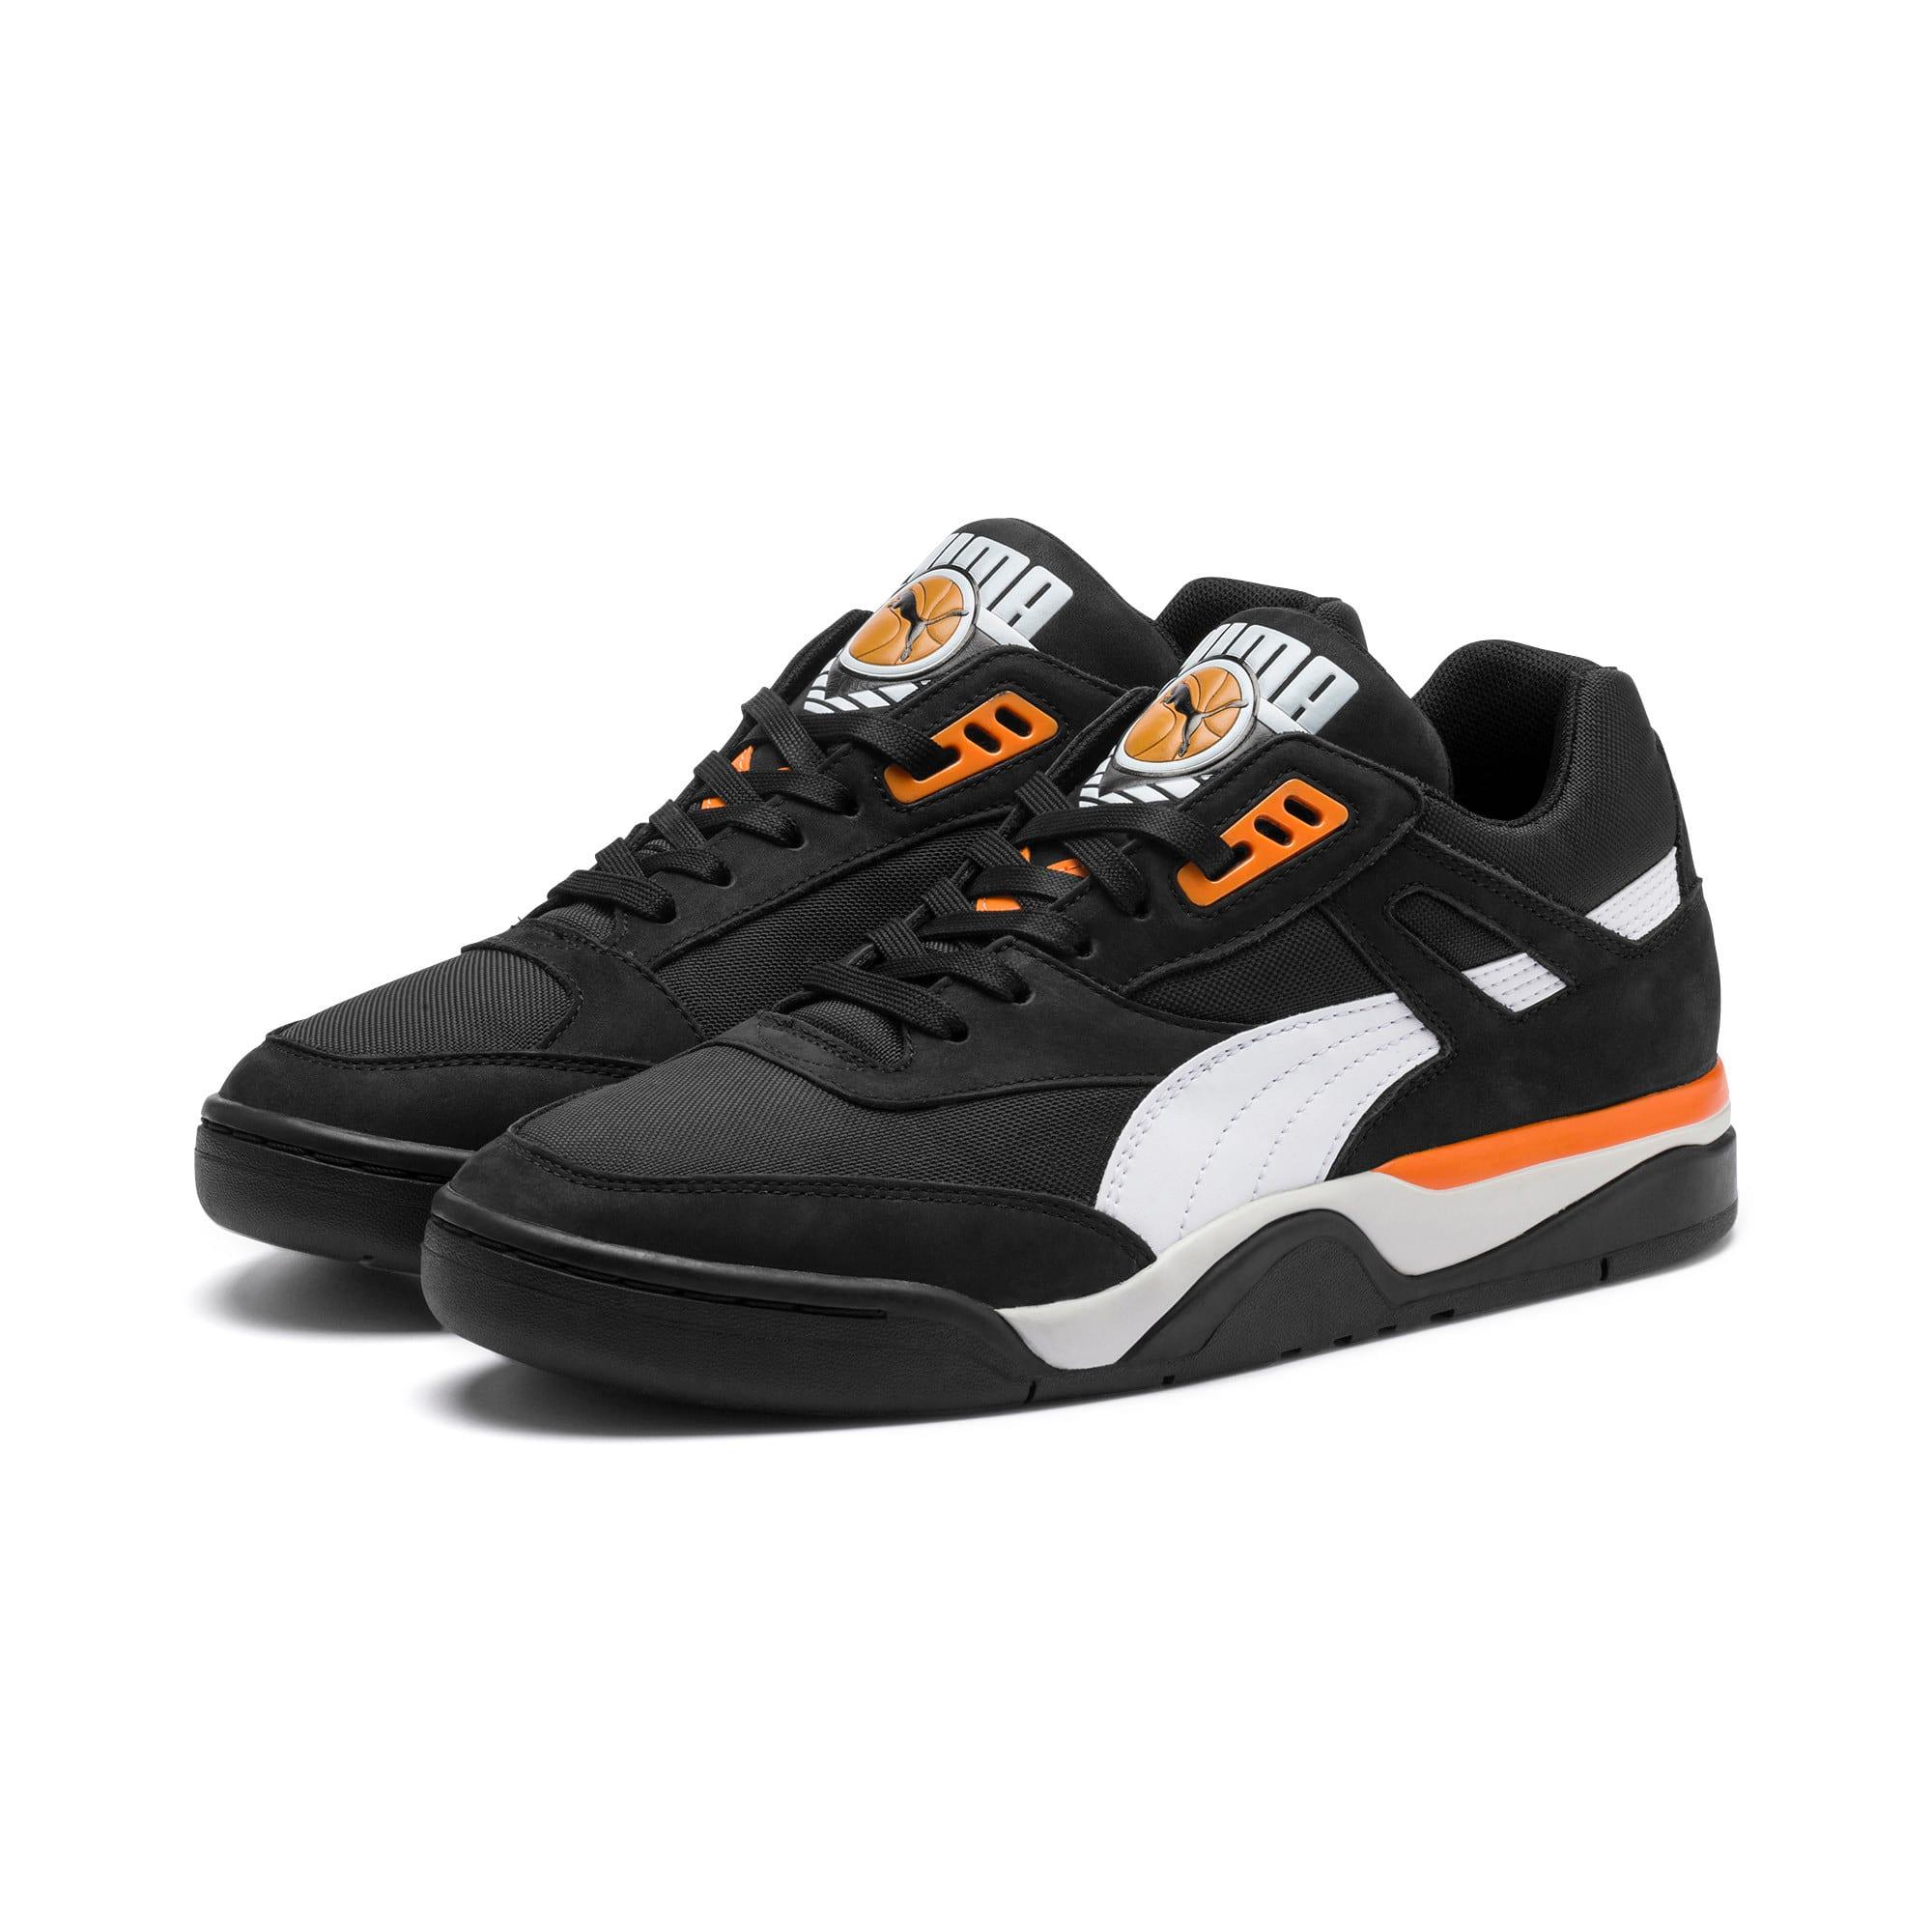 Thumbnail 2 of Palace Guard Bad Boys Sneaker, Puma Black-Puma White-, medium